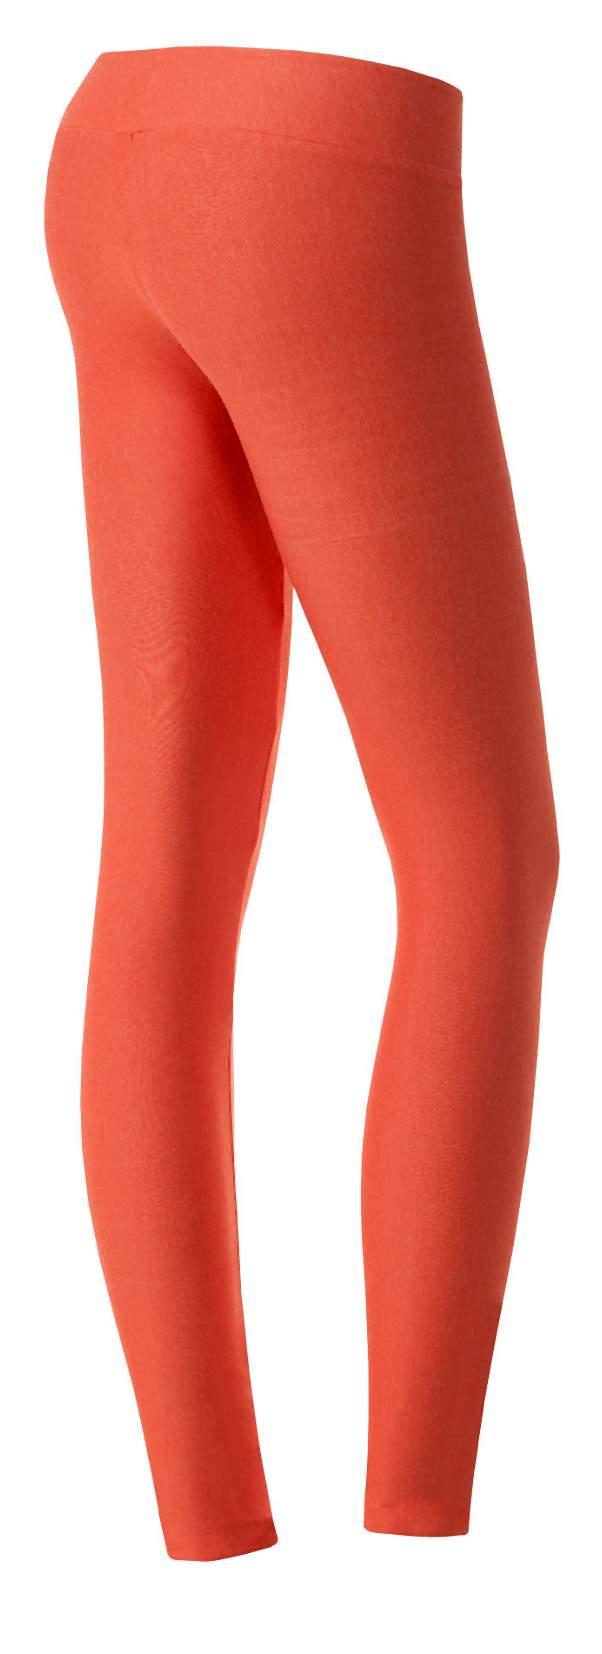 Kolorowe legginsy push-up nowe legginsy od Calzedonia